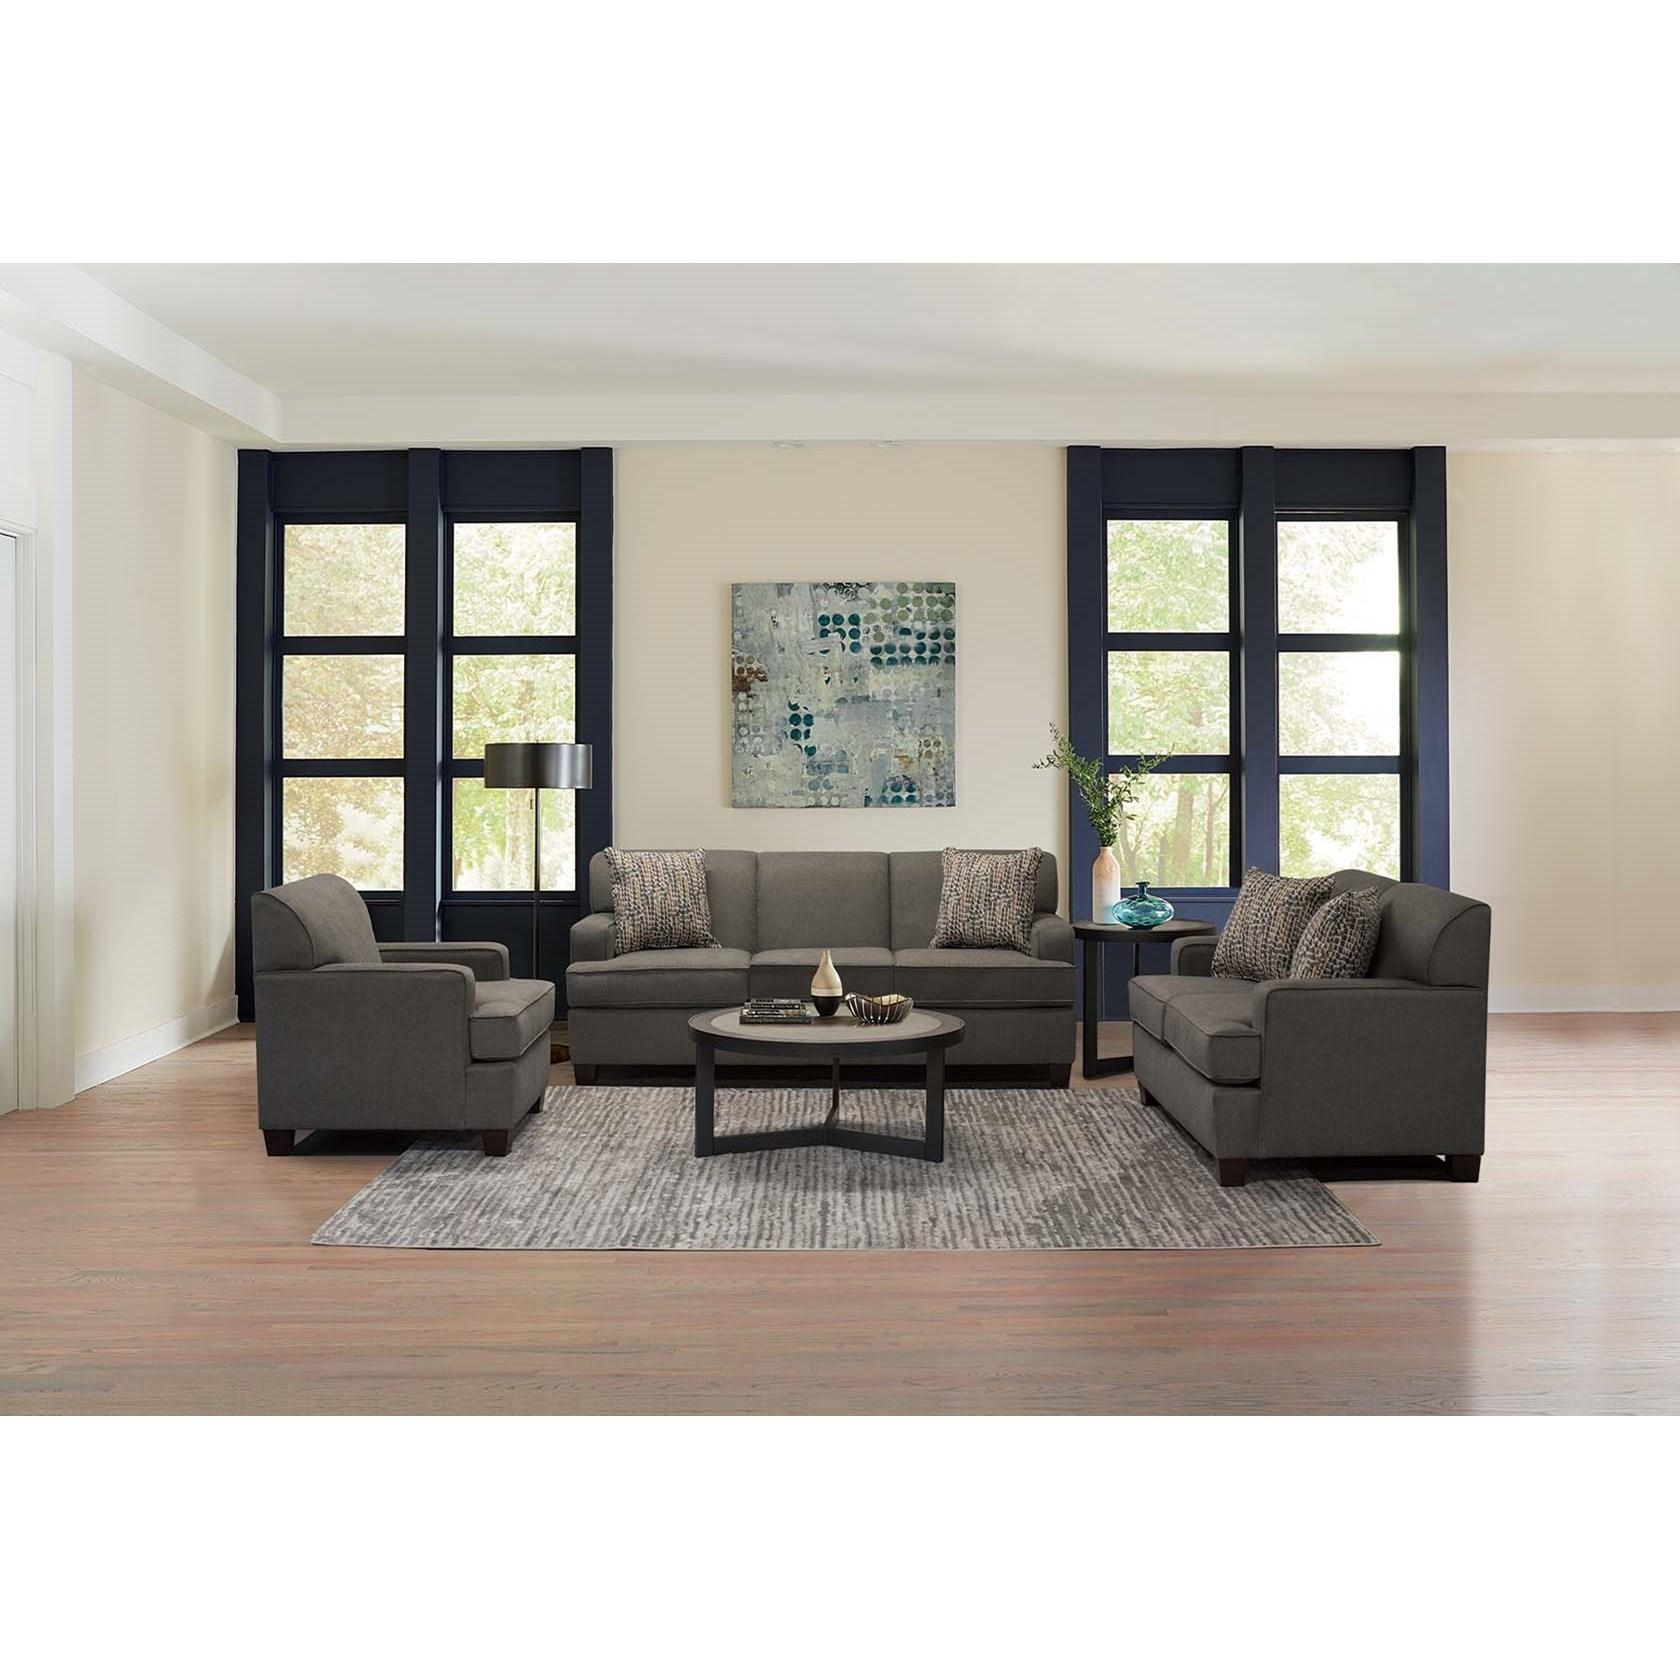 England Ember Transitional Living Room Group Esprit Decor